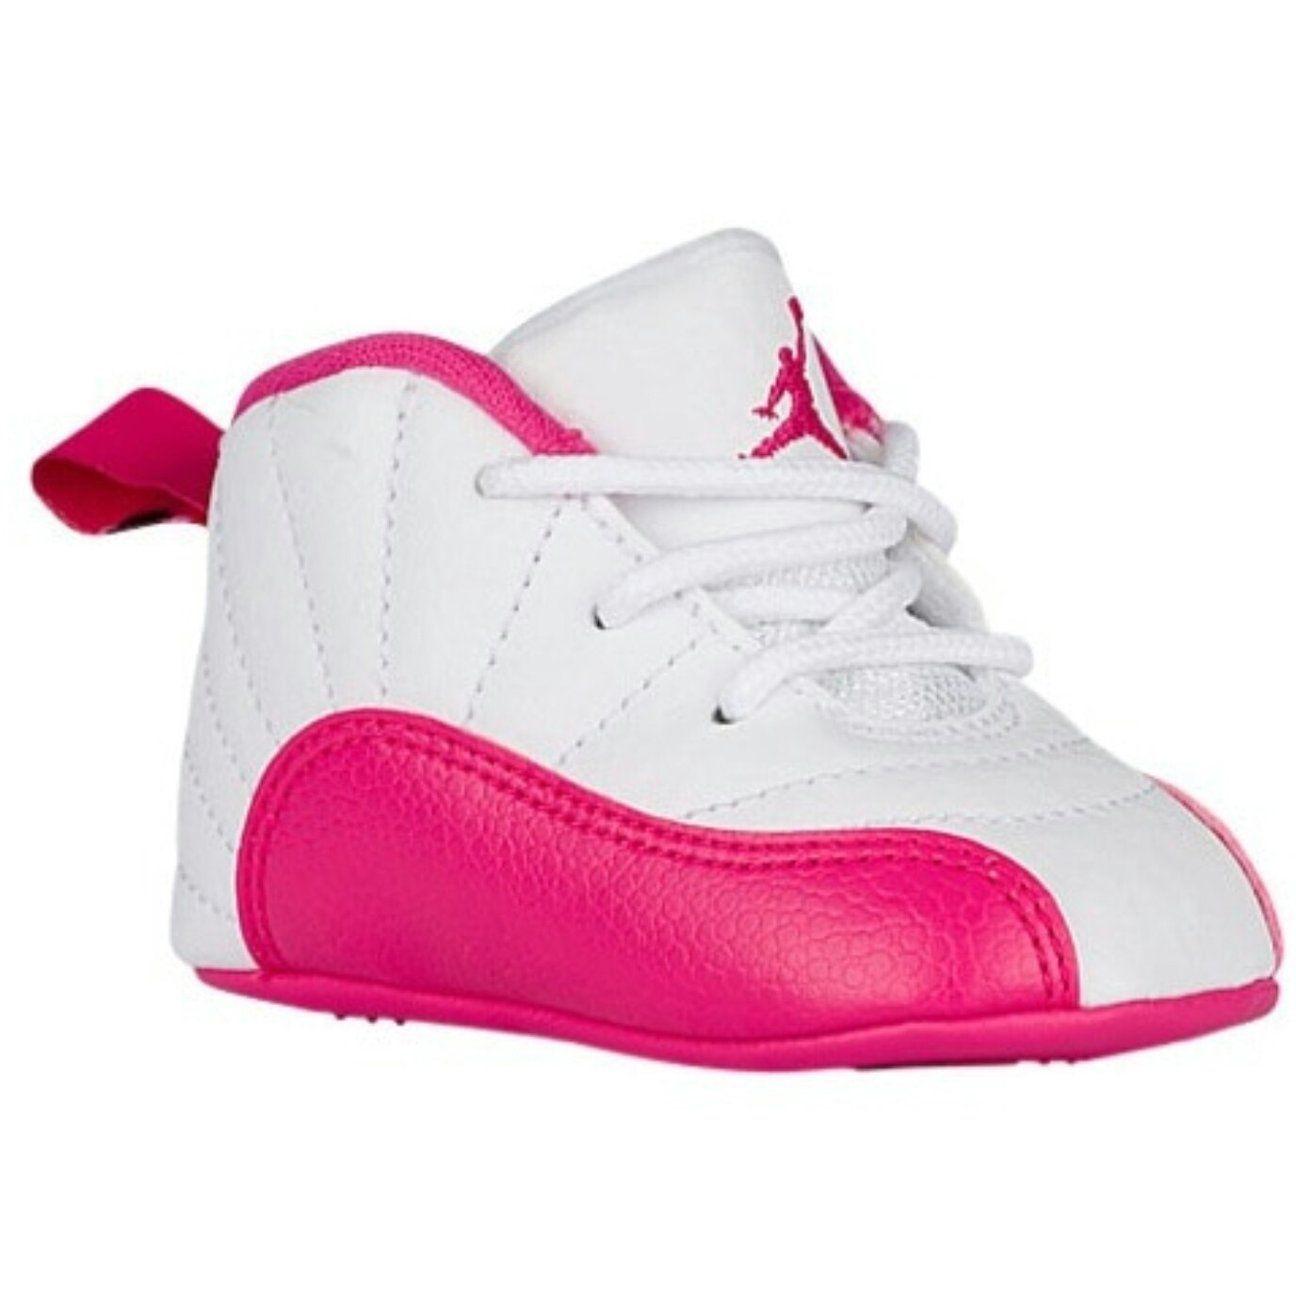 INFANT AIR JORDAN RETRO 12 VIVID PINK | Cute baby shoes, Baby girl ...